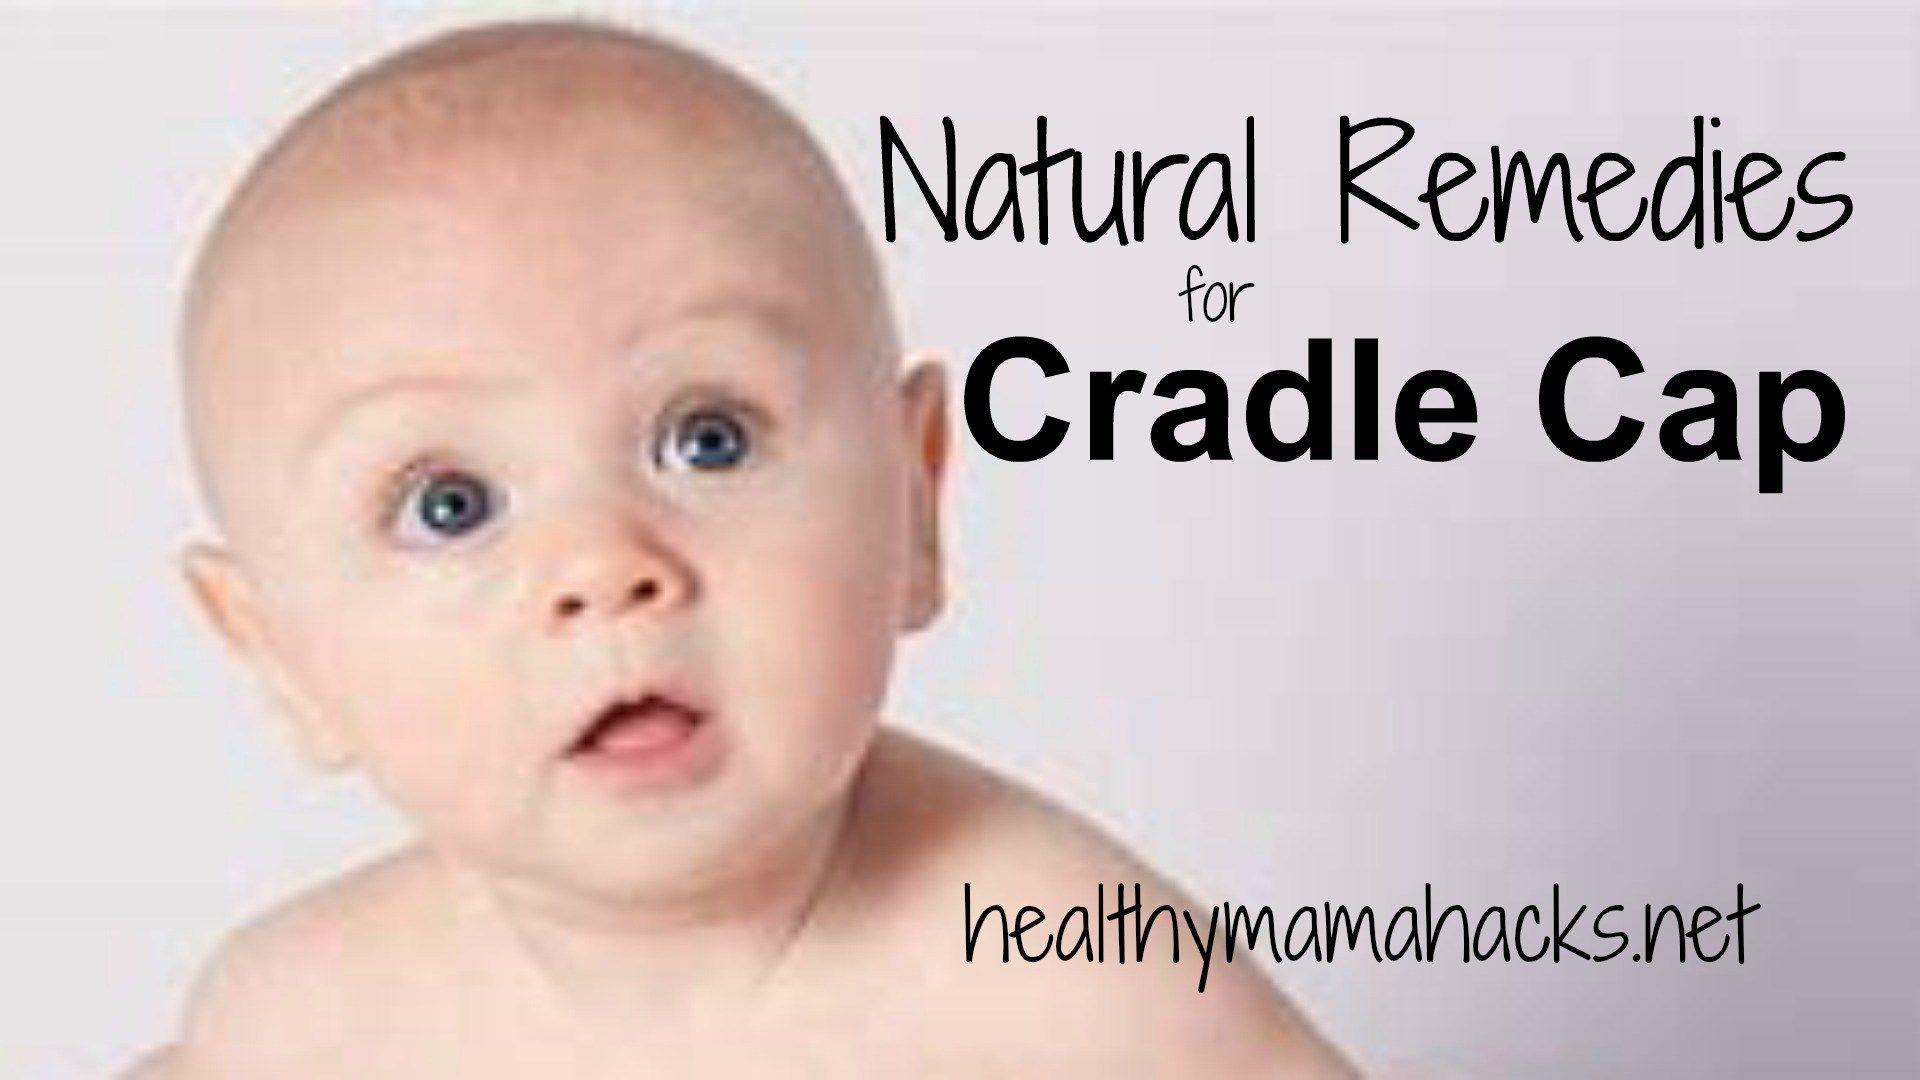 Cradle Cap Remedies That Are Natural Safe And Effective Cradle Cap Holistic Health Remedies Natural Remedies